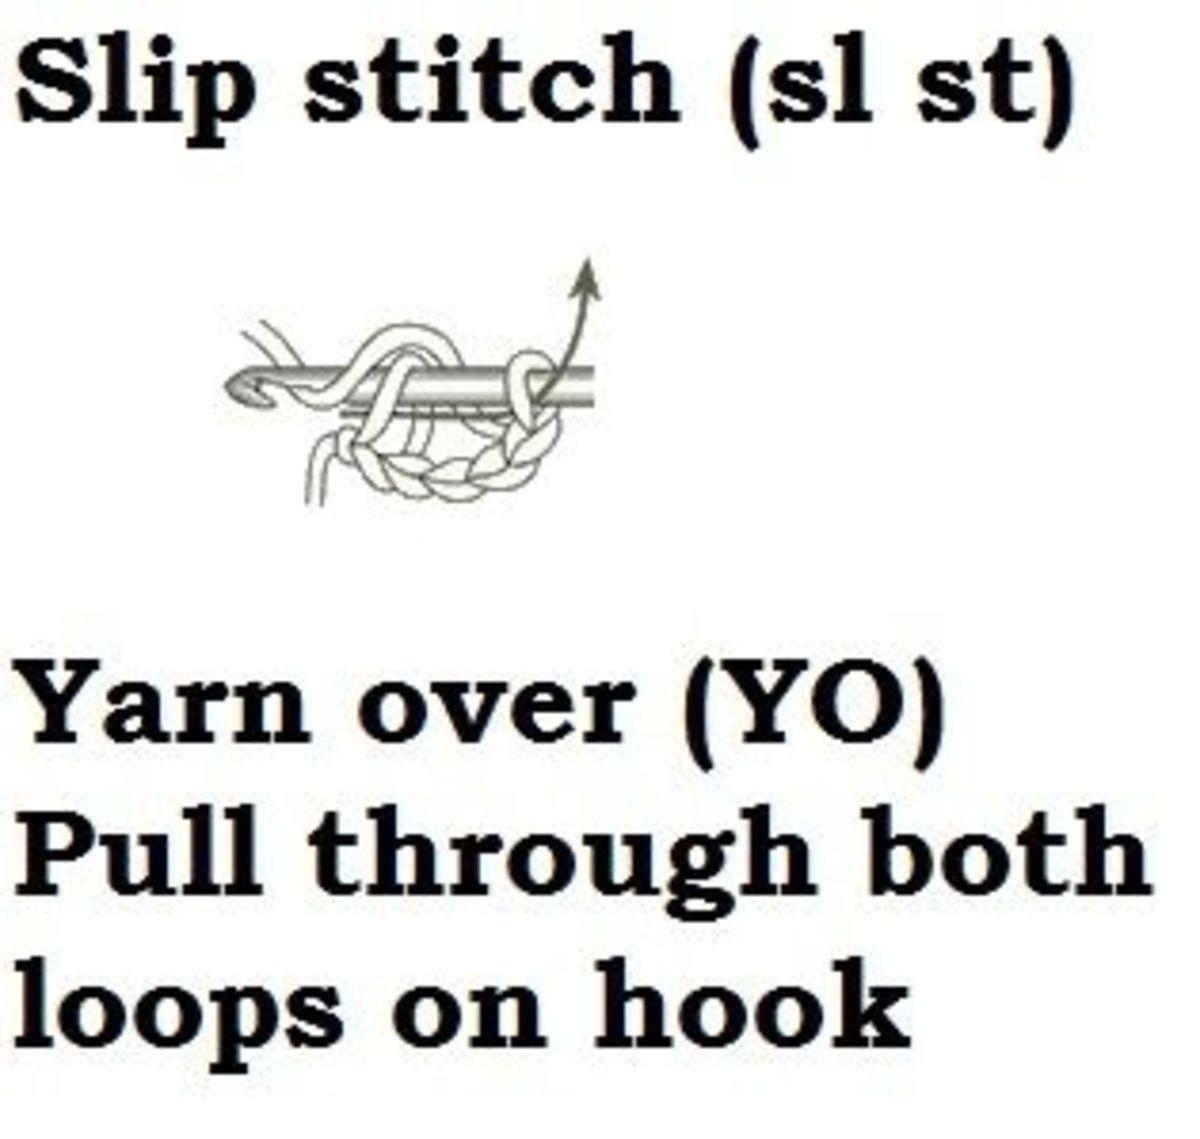 slip stitch-sl st- learn how to crochet